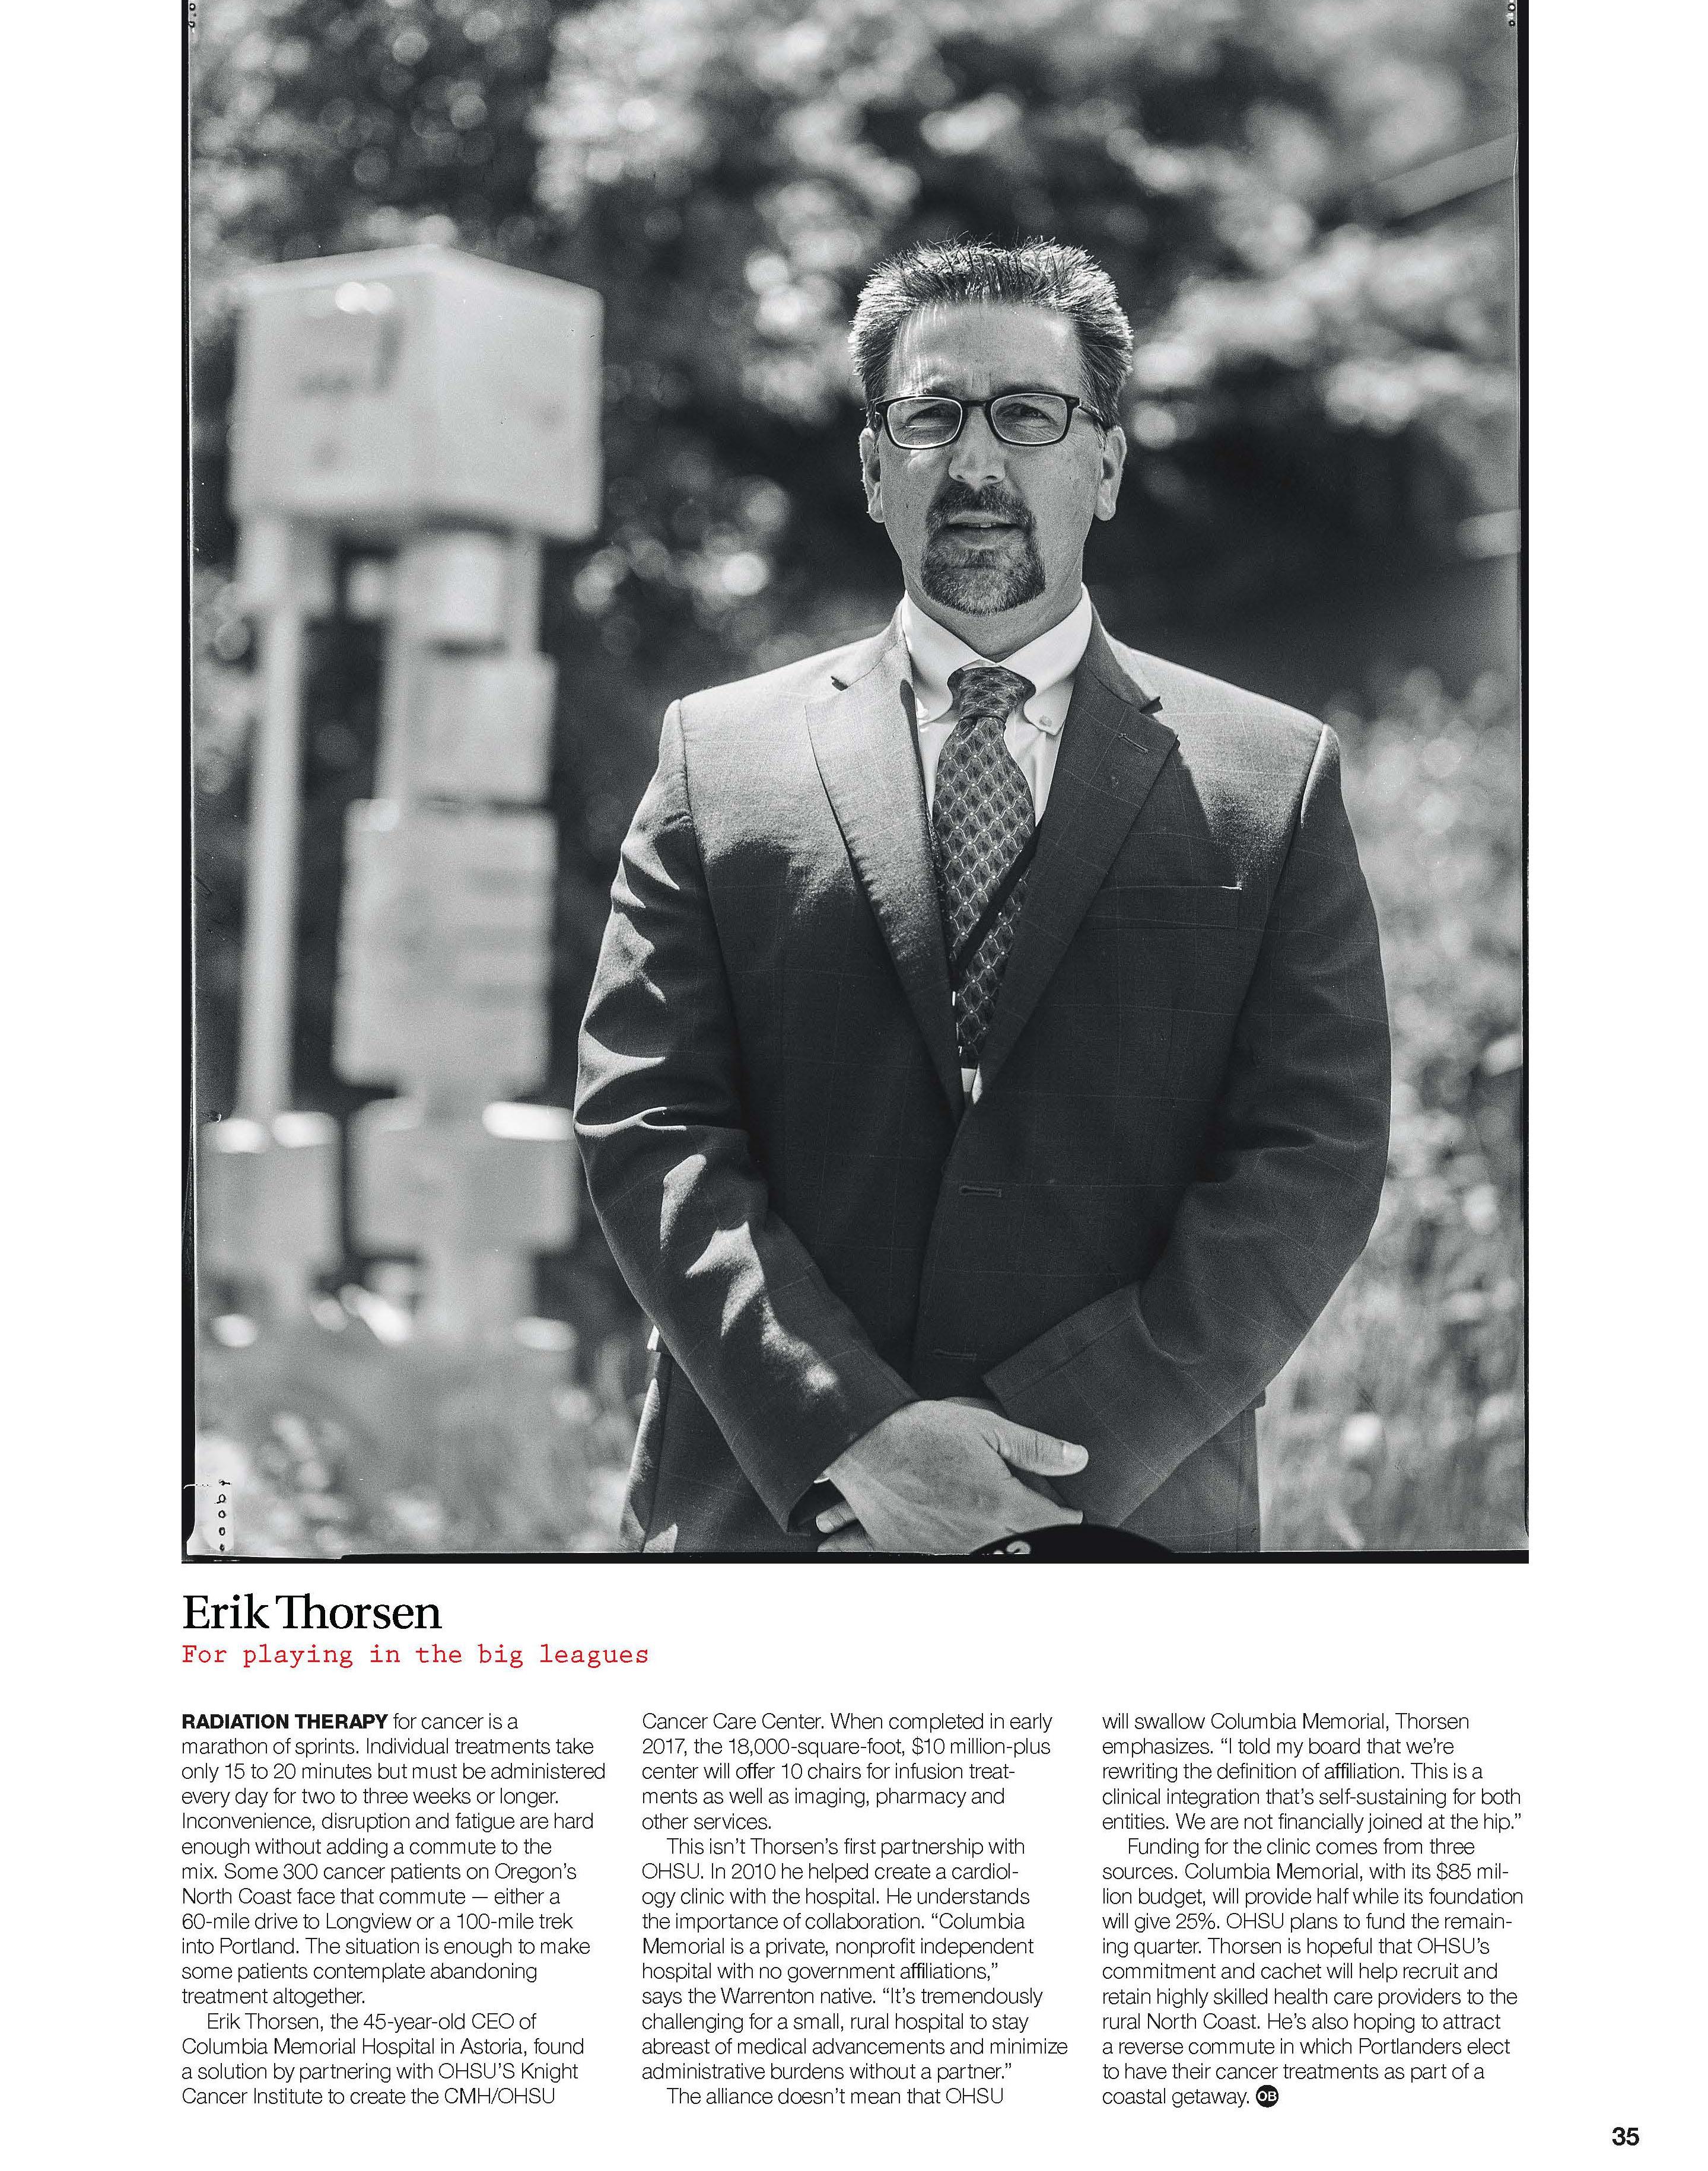 Erick Thorsen stands outdoors in suit in environmental portrait